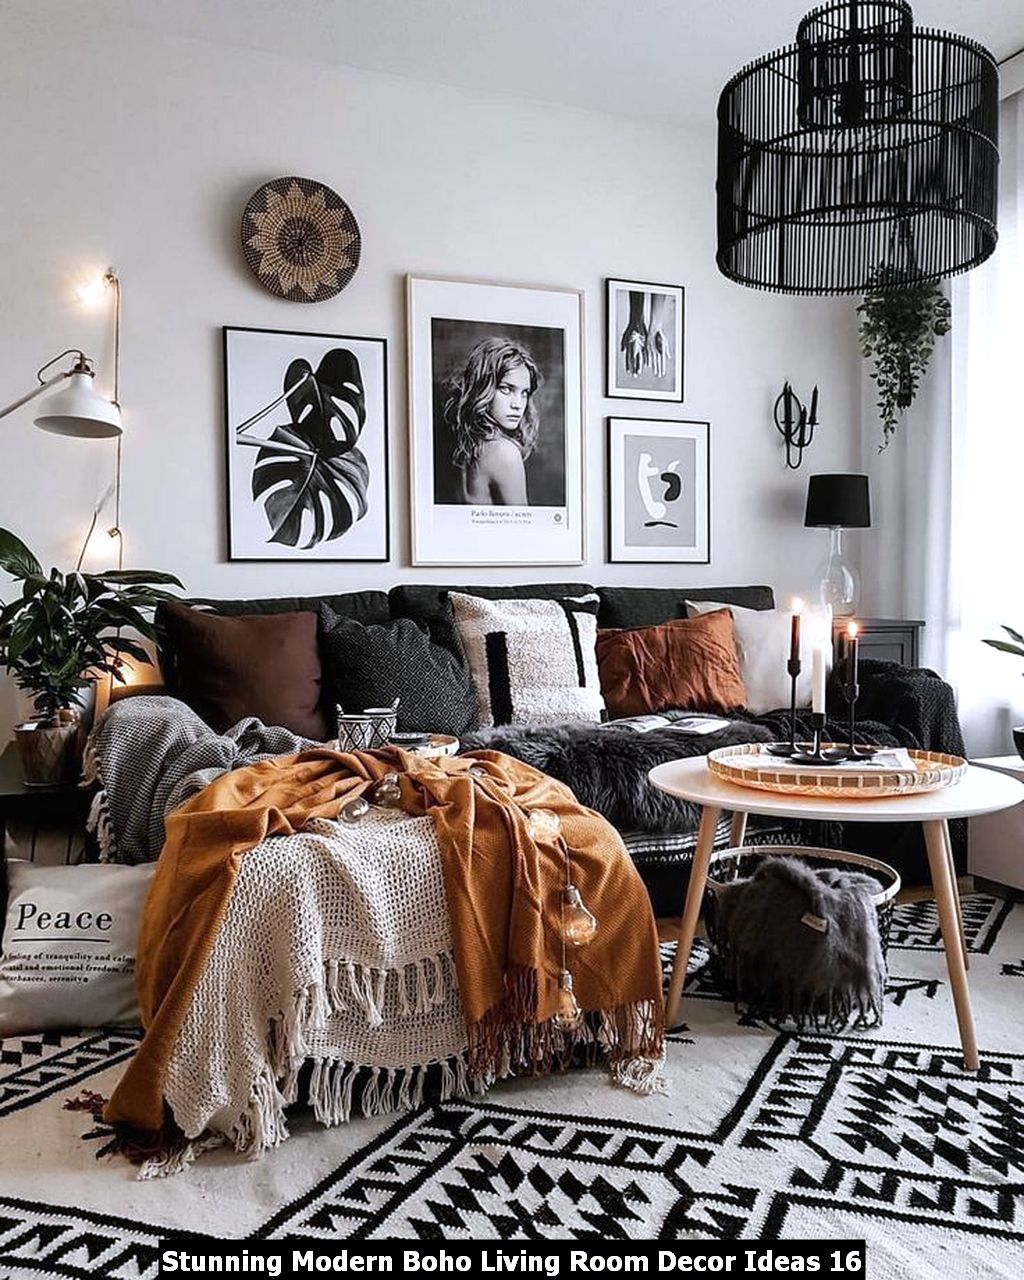 Stunning Modern Boho Living Room Decor Ideas 16